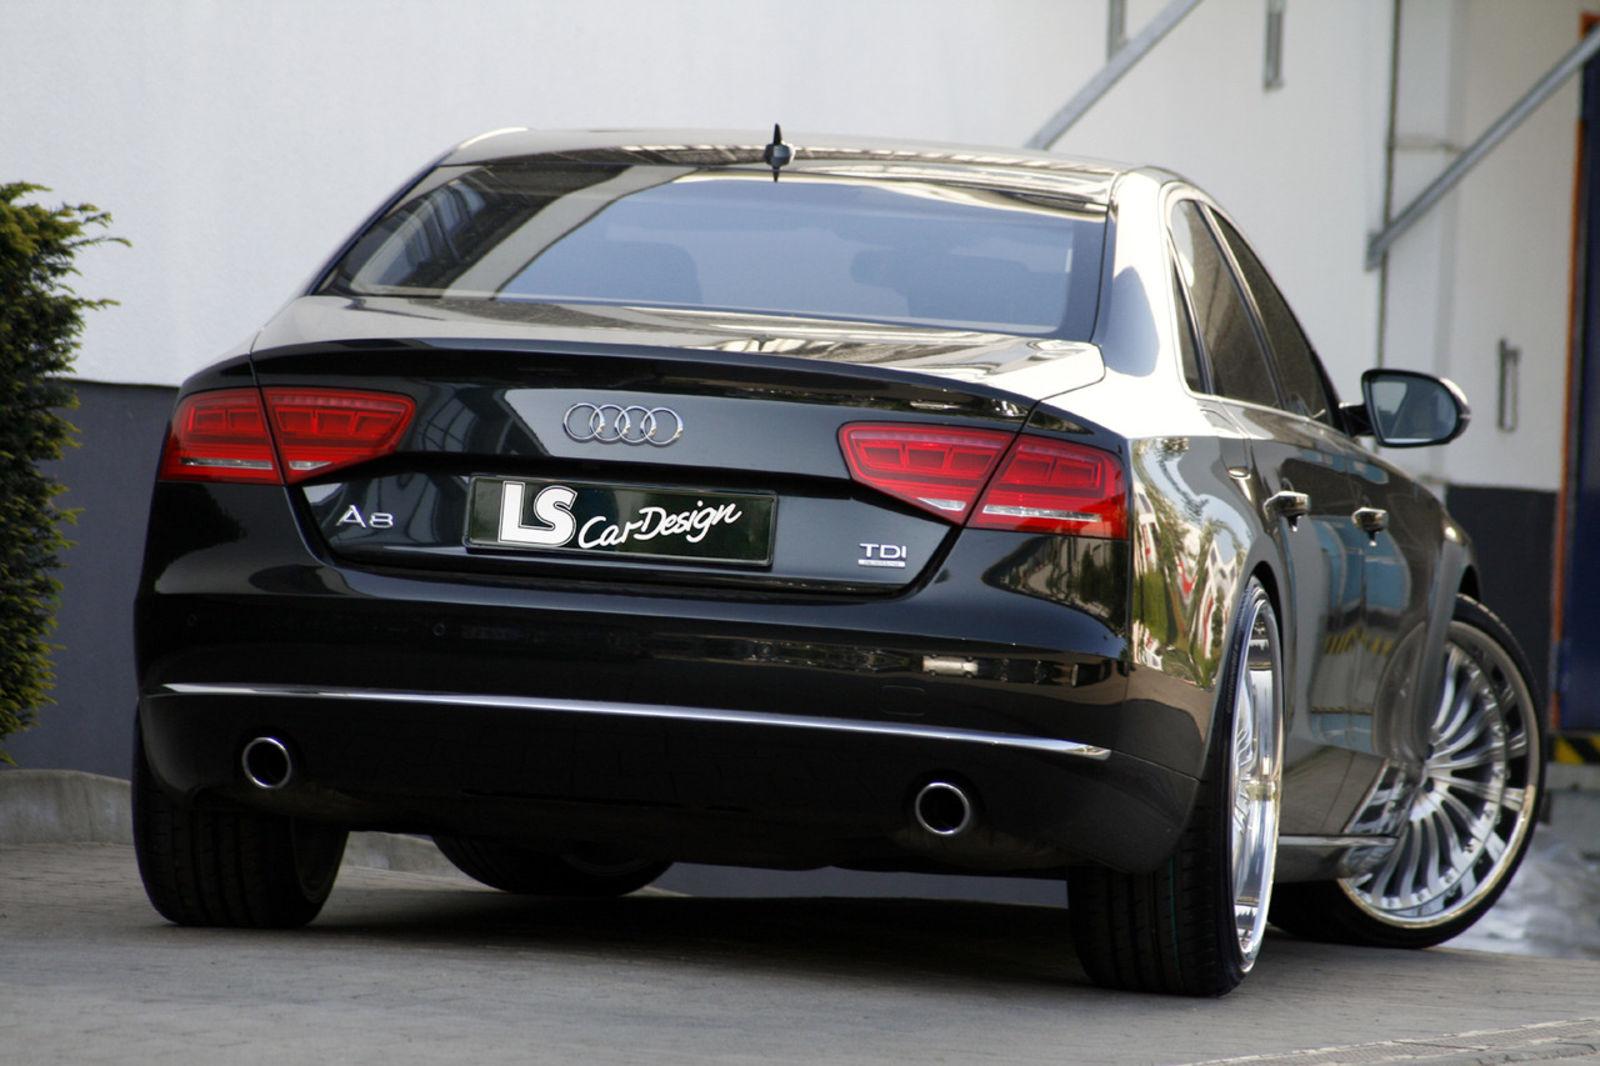 News Alufelgen Neuer Audi A8 4h Mit 22zoll Leichtmetallfelgen